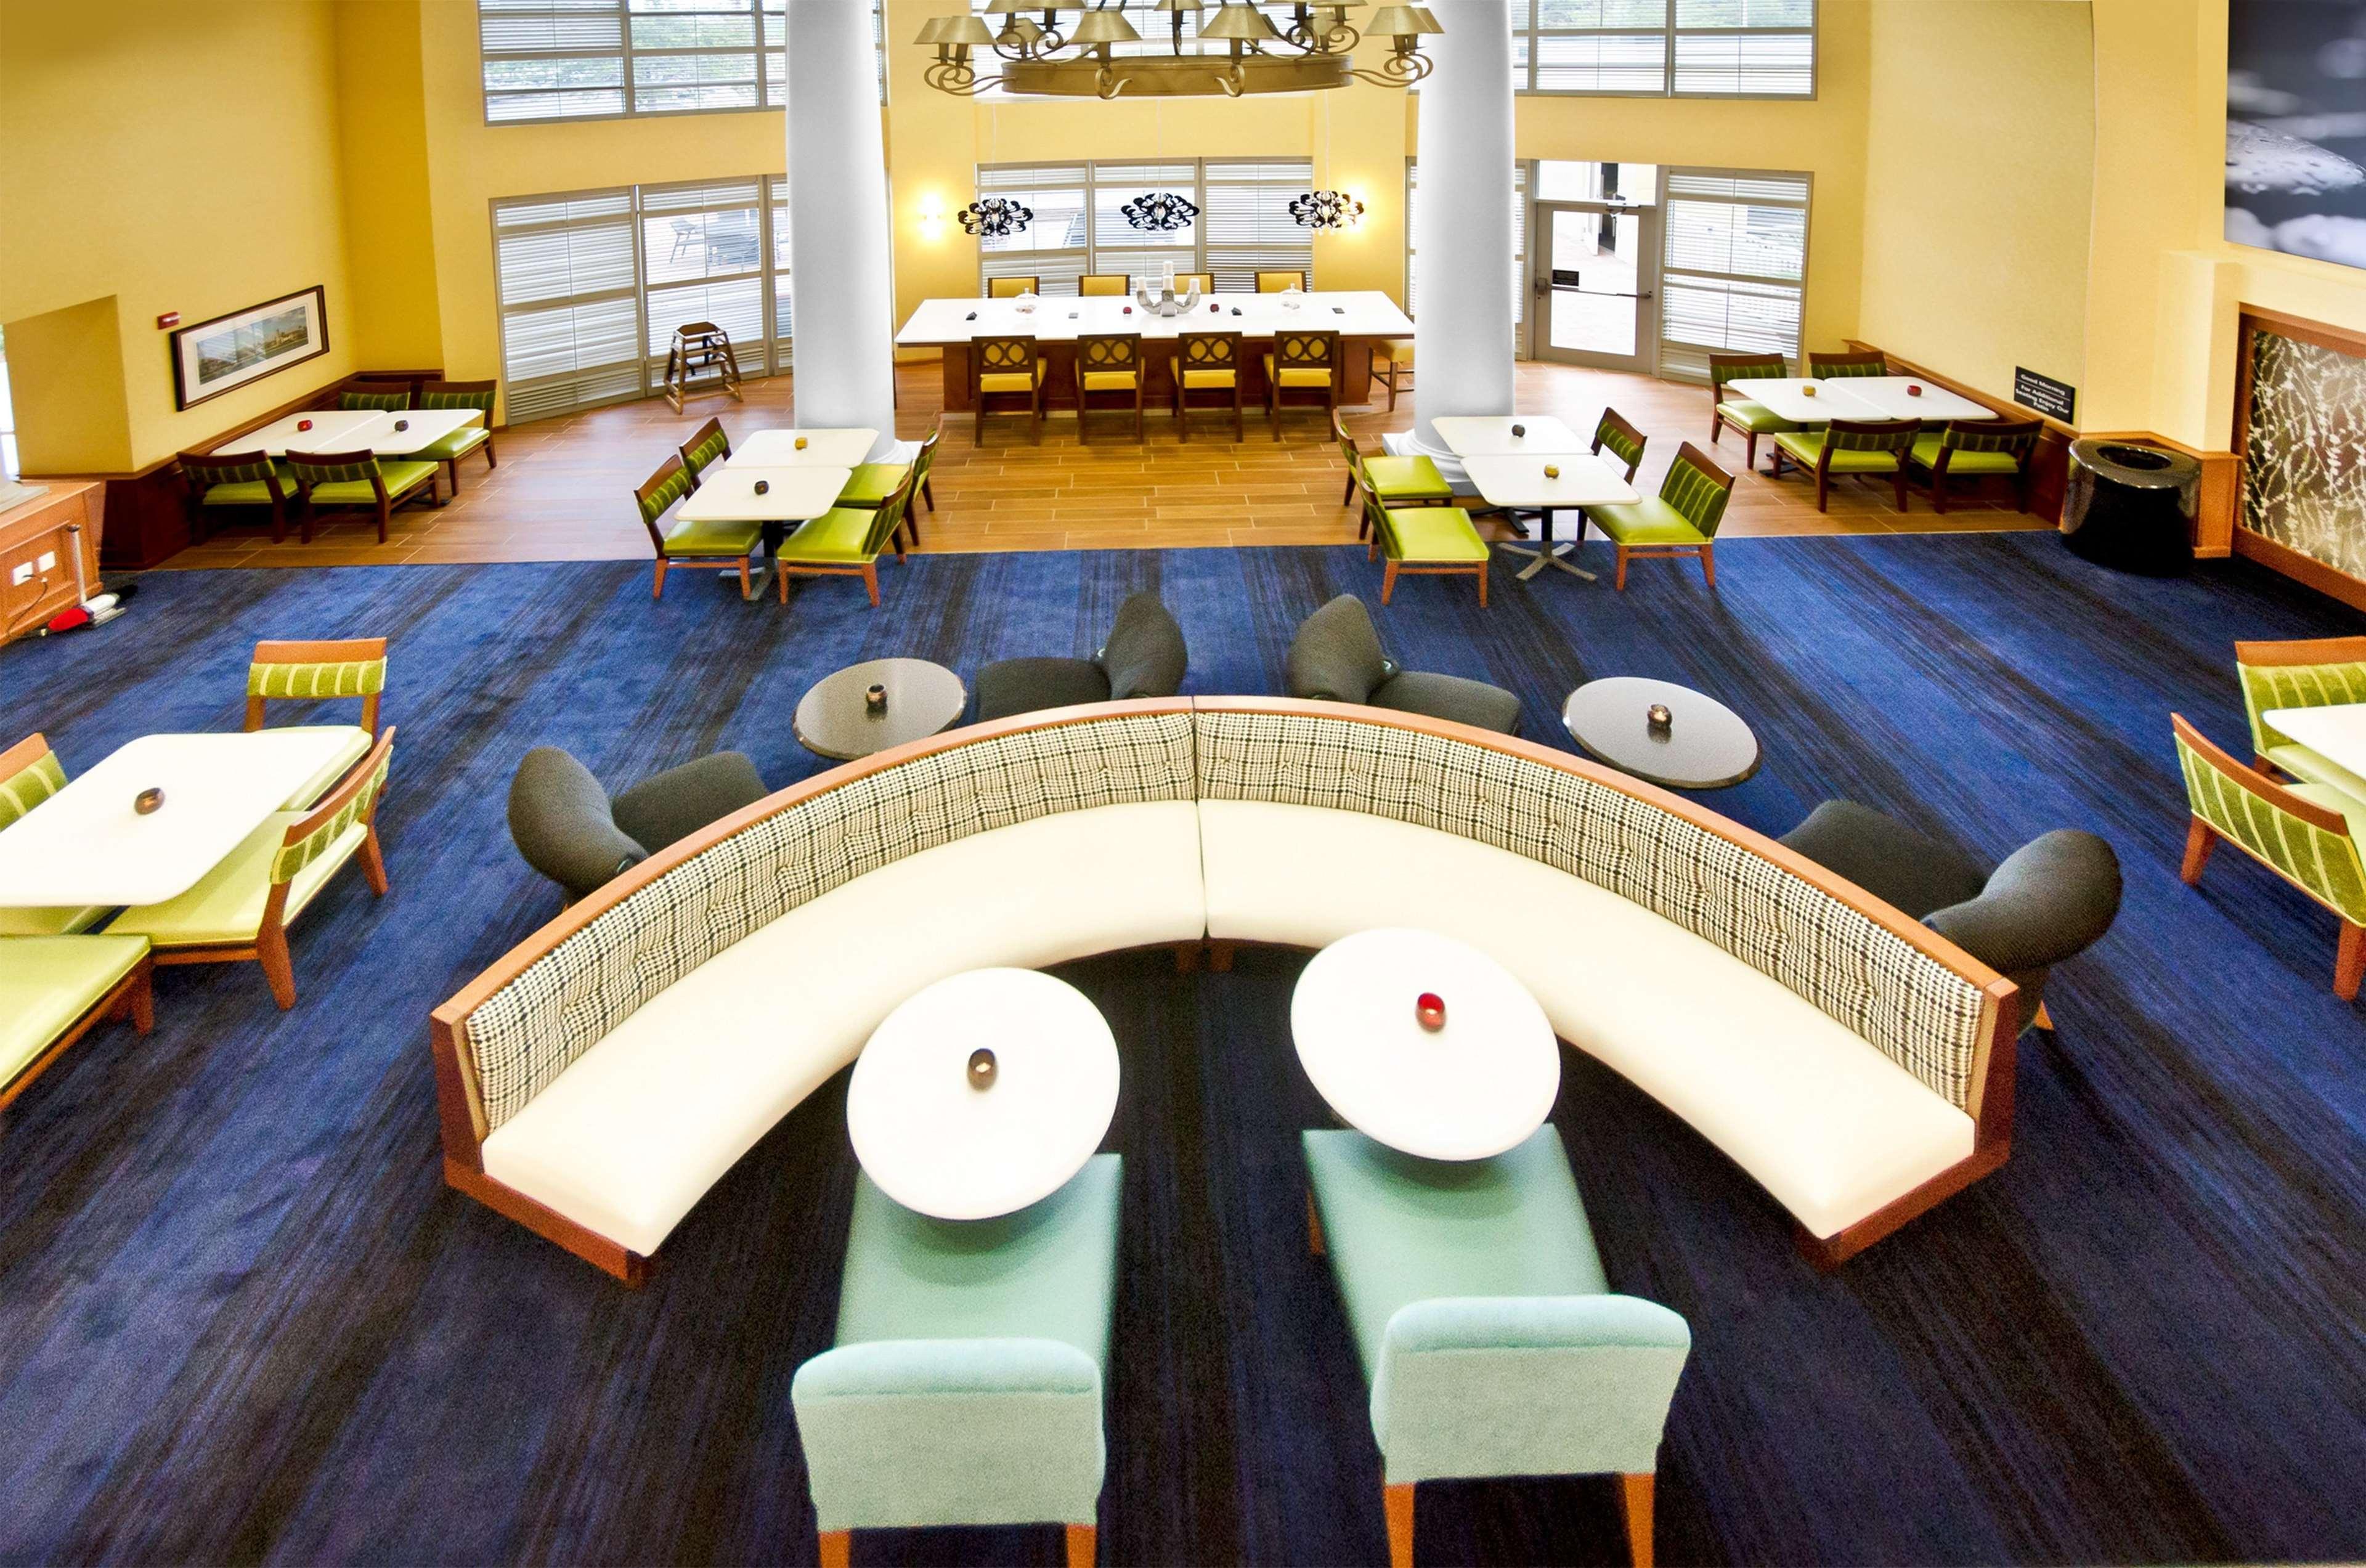 Hampton Inn & Suites Jacksonville South-St. Johns Town Center Area image 33